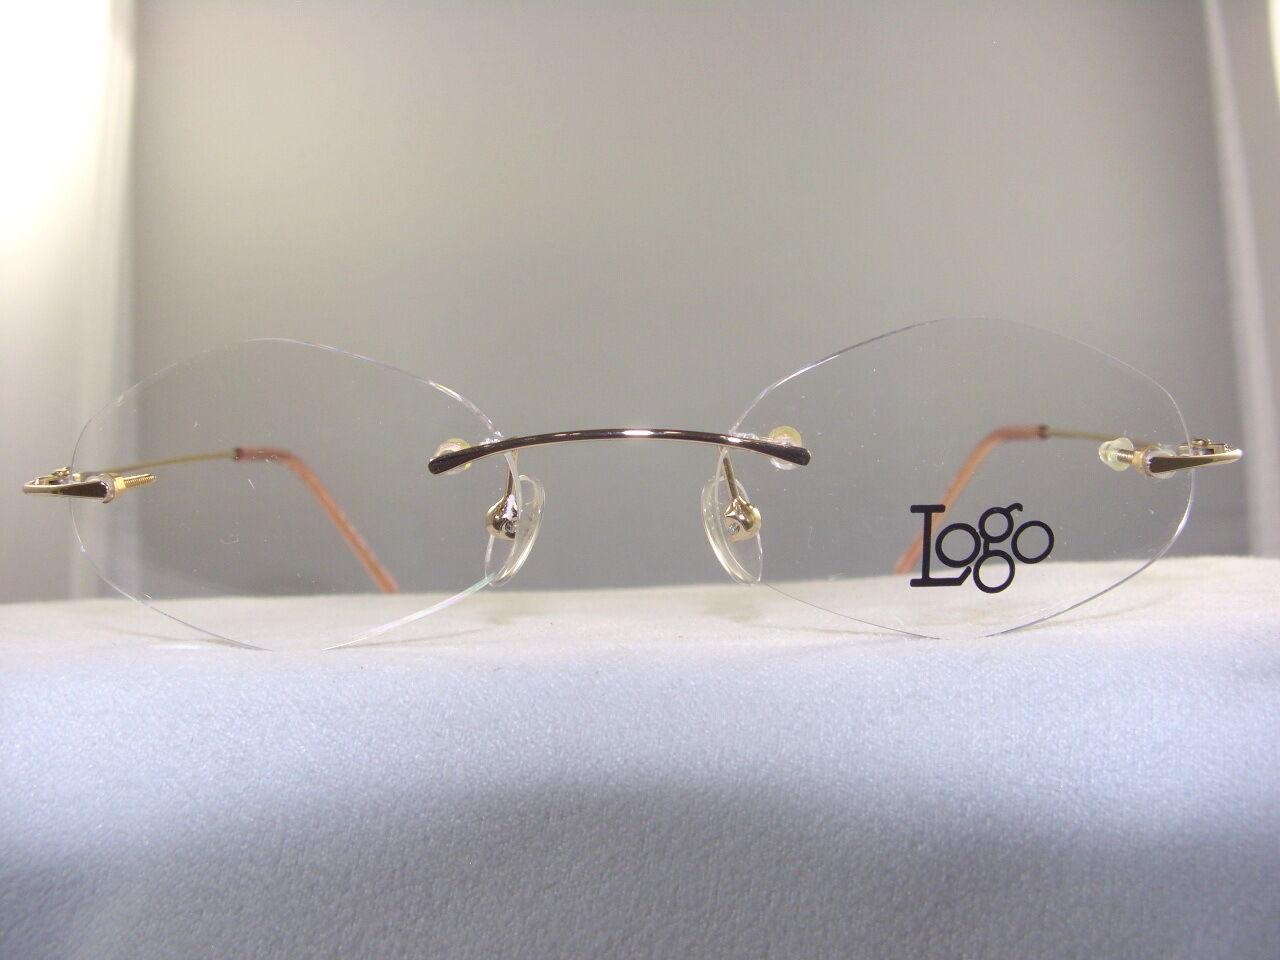 Eyeglass Frame Pieces : WOMENS 3 PIECE RIMLESS EYEGLASS FRAME IN GOLD #6020